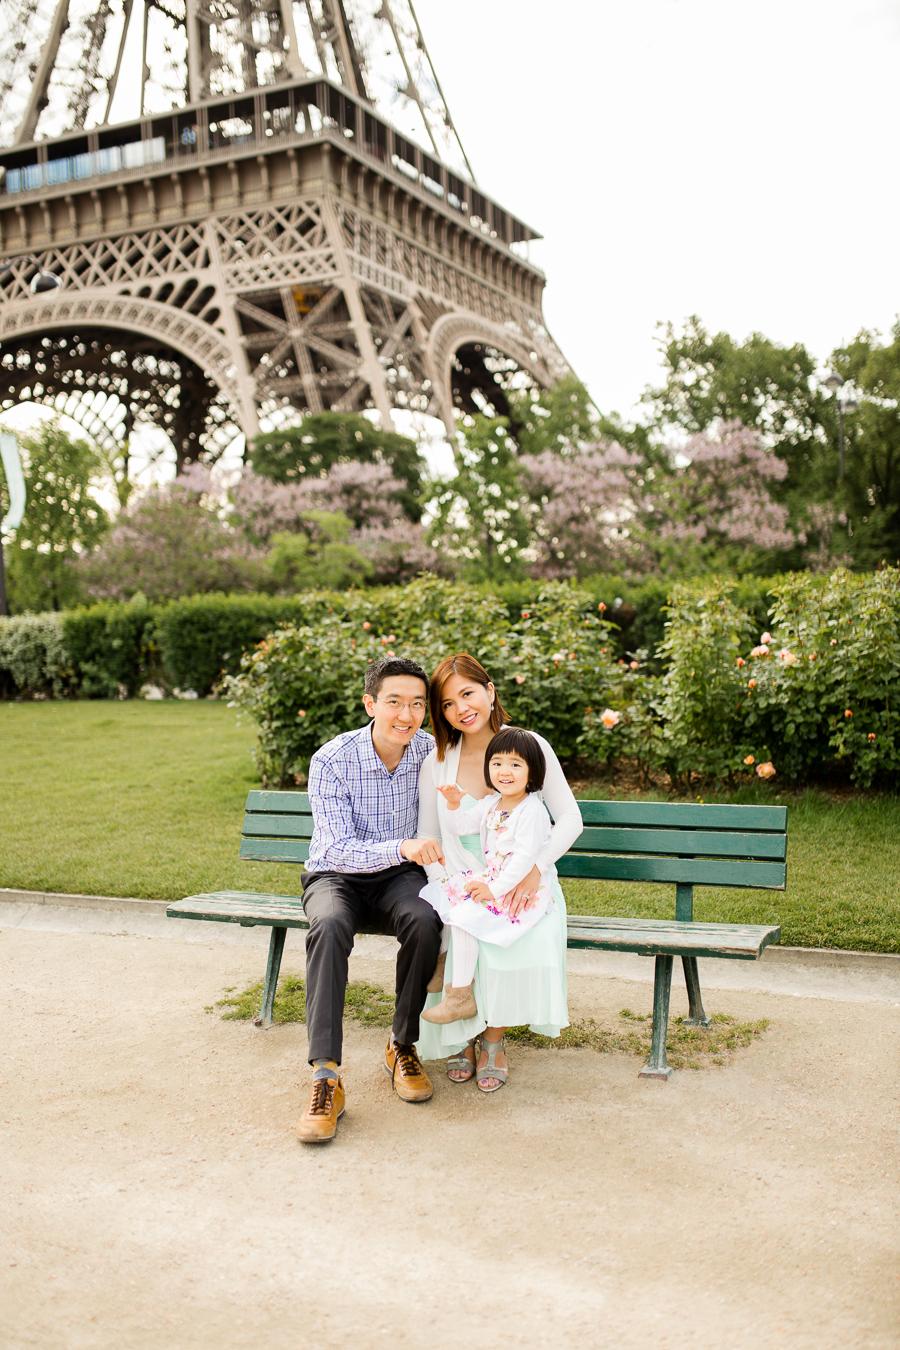 family-portraits-eiffel-tower-paris-photographer_007.jpg